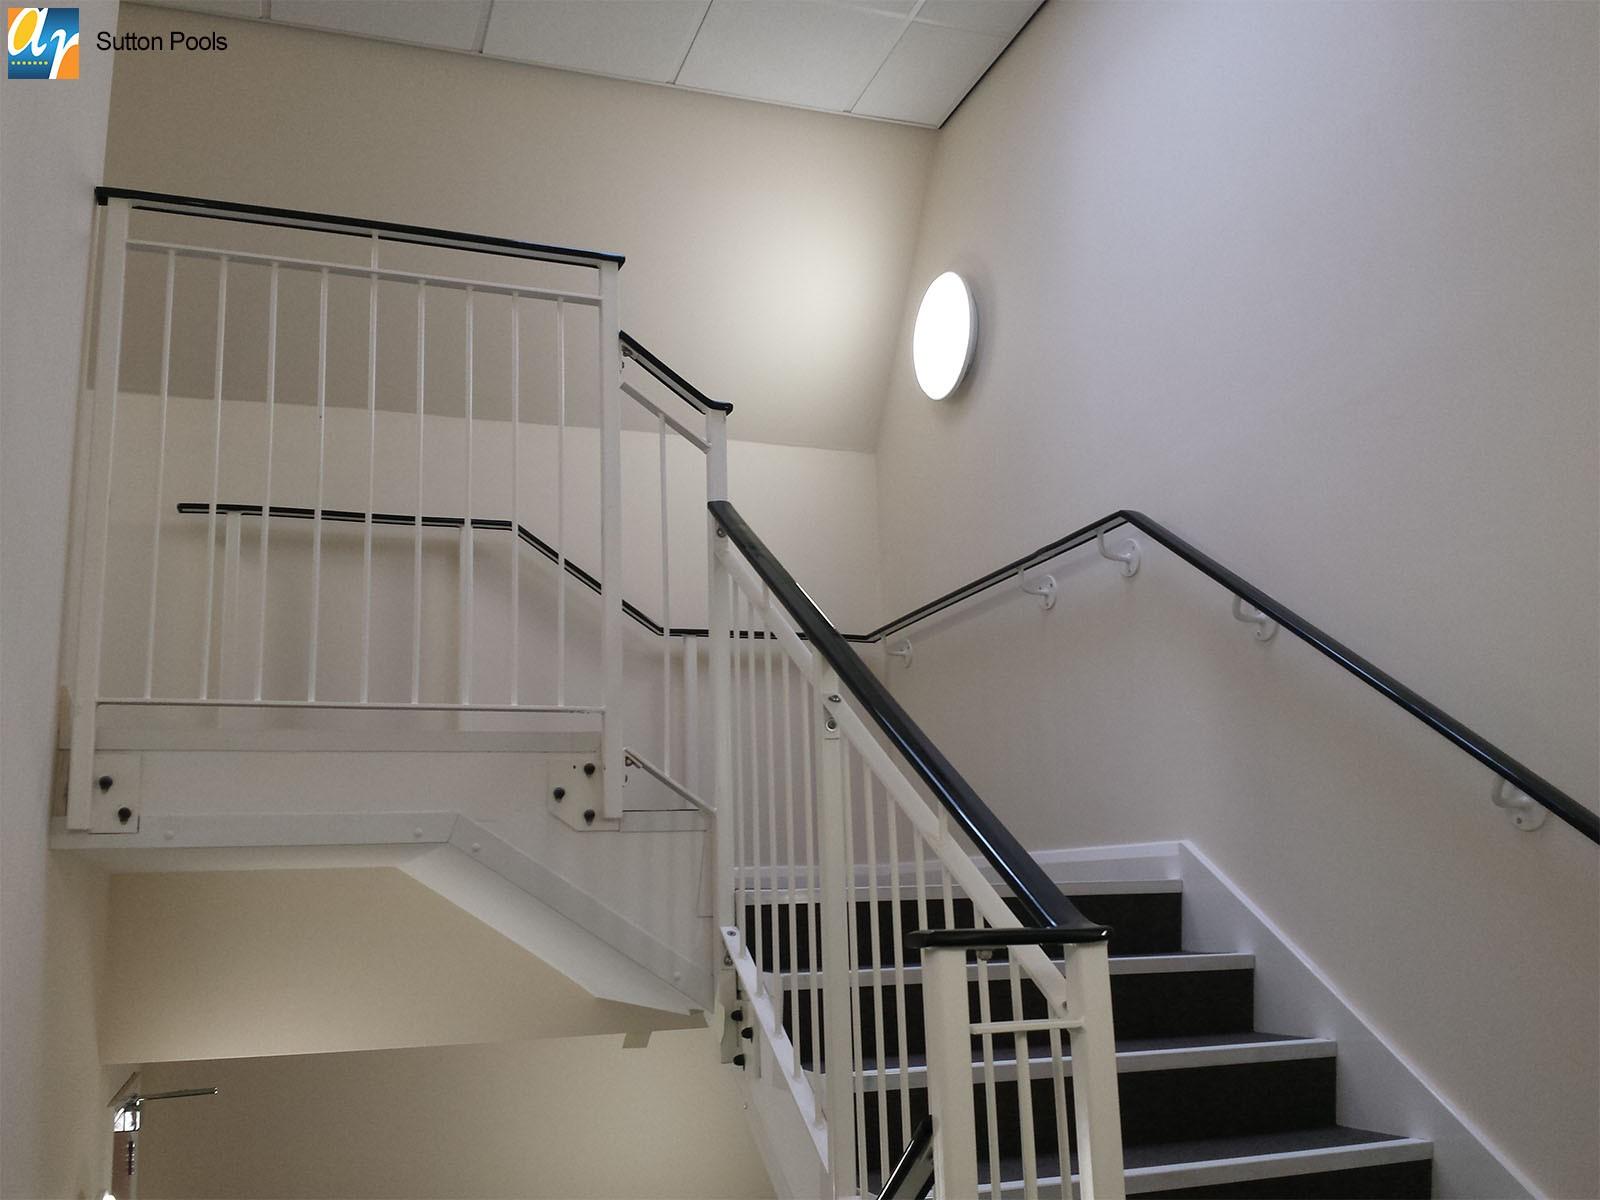 Sutton pools stair railings